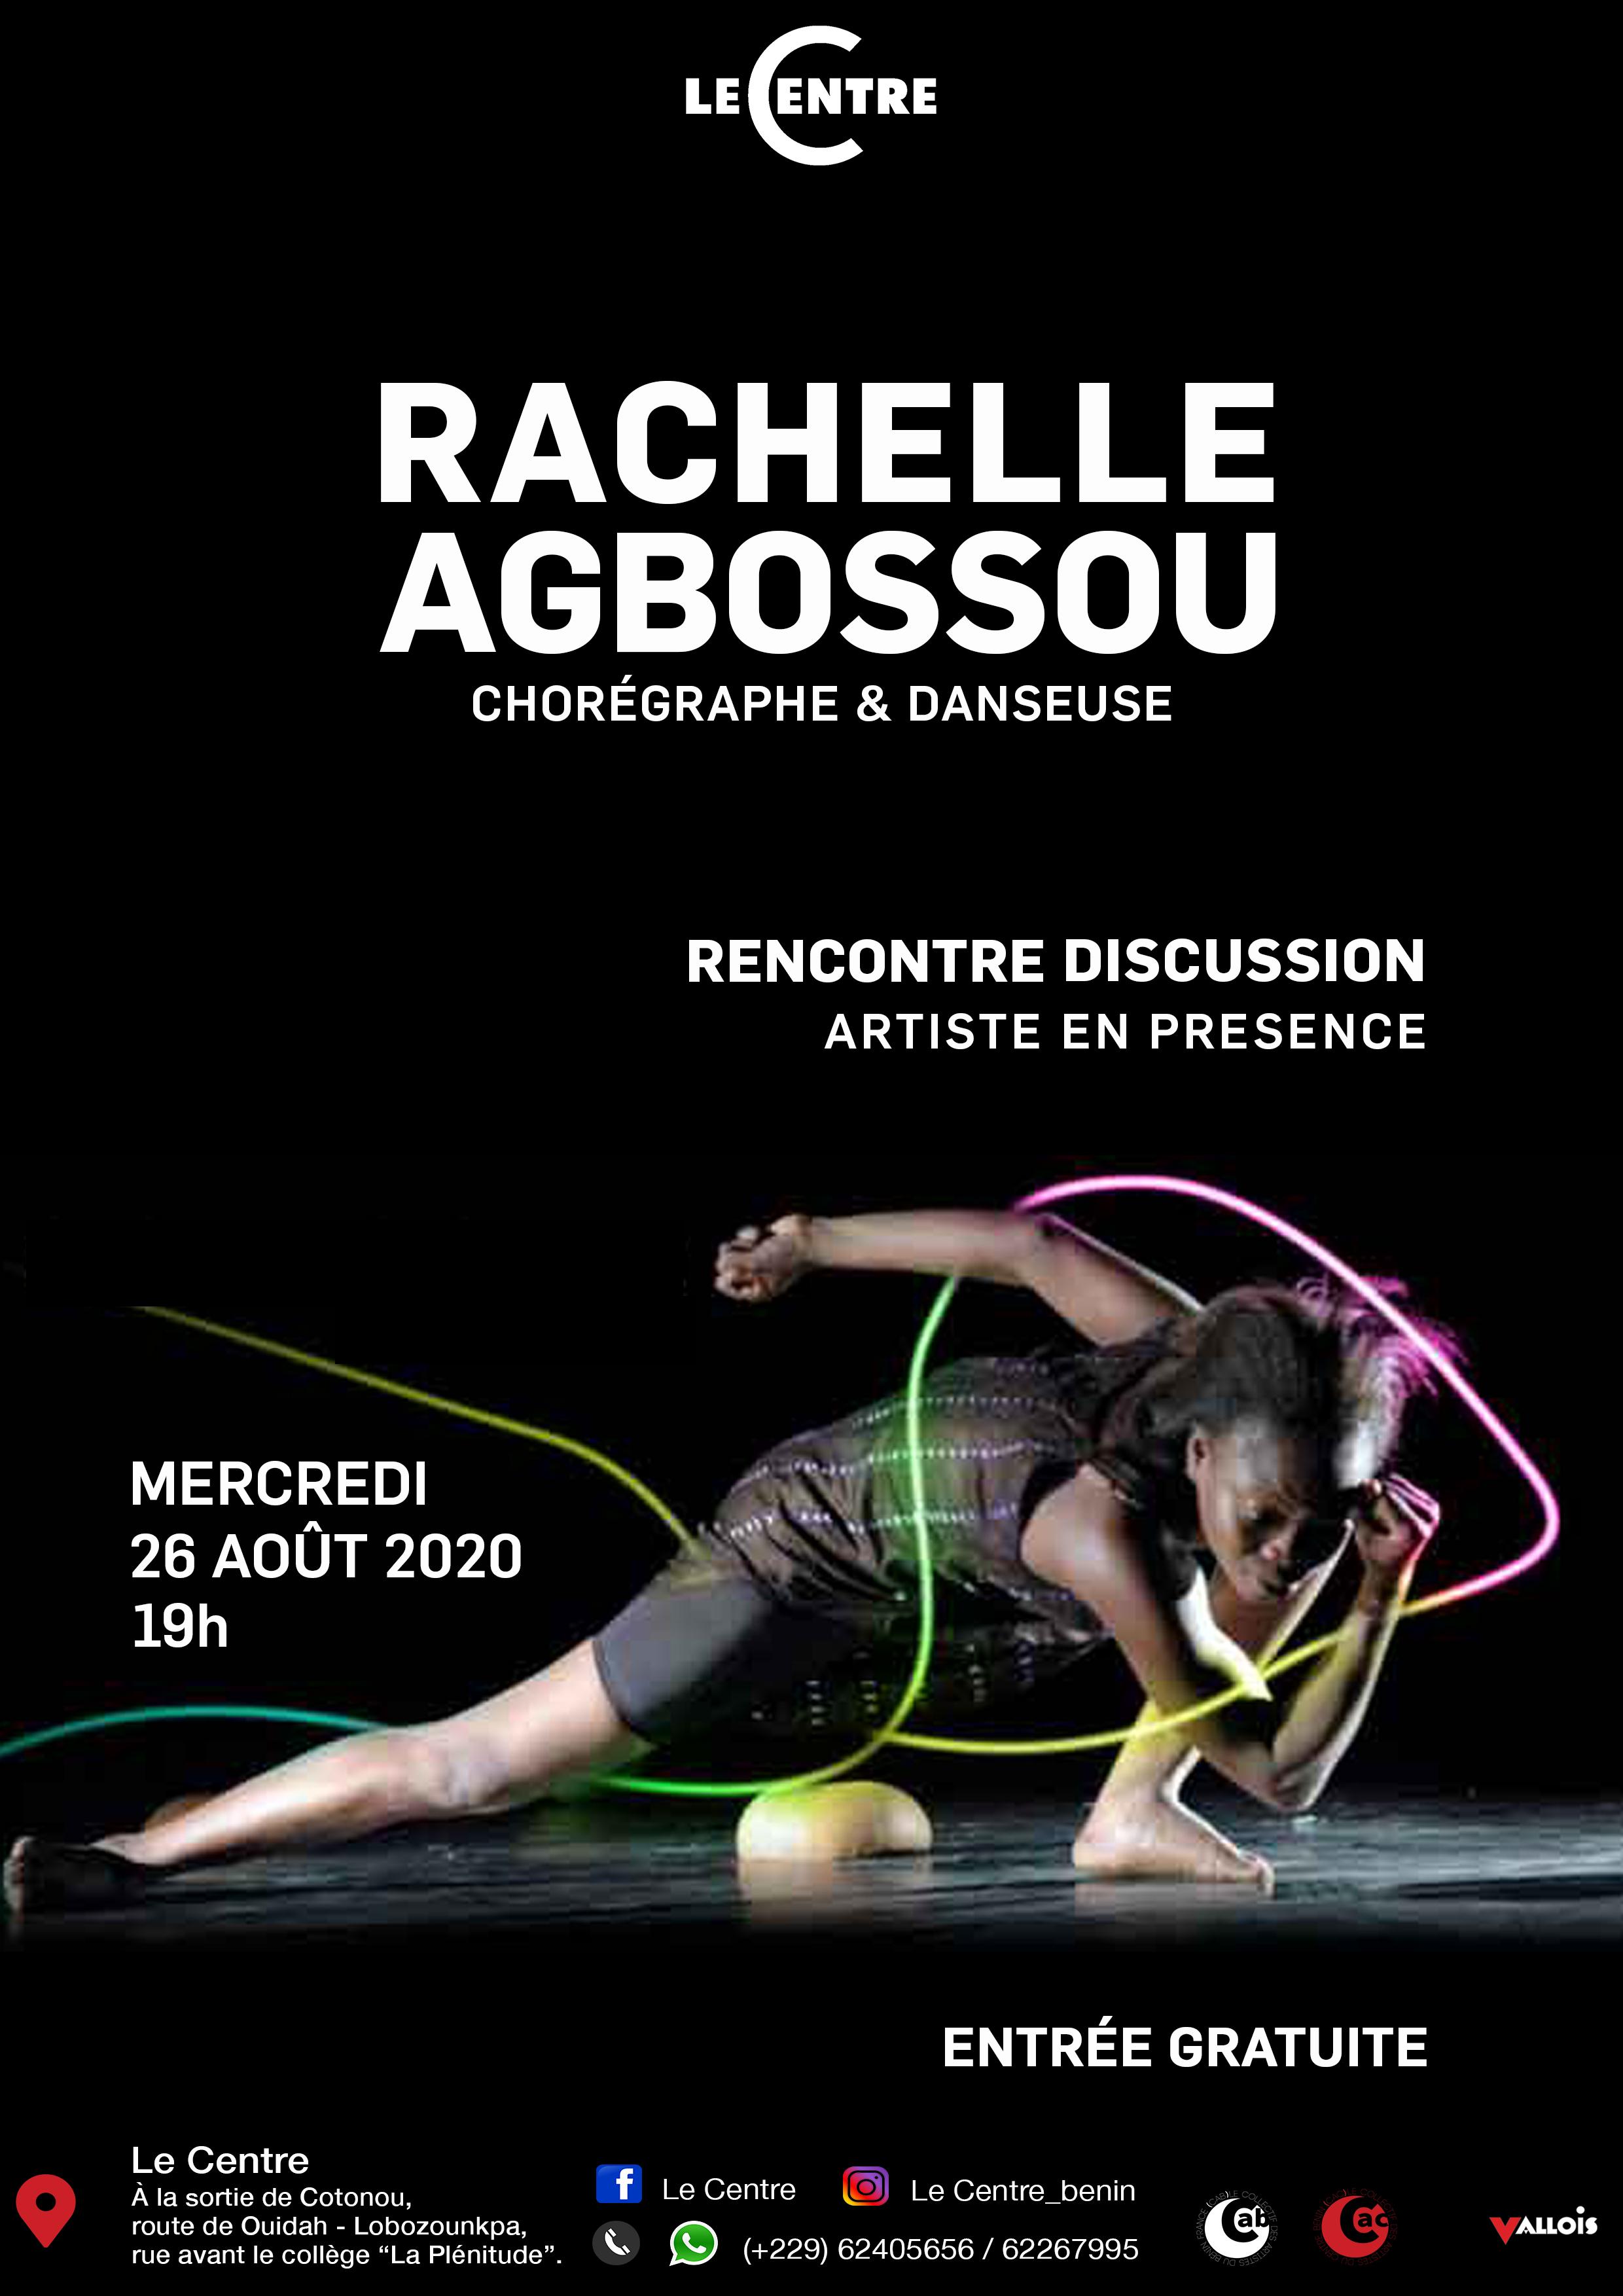 Artiste en présence, Rachelle Agbossou